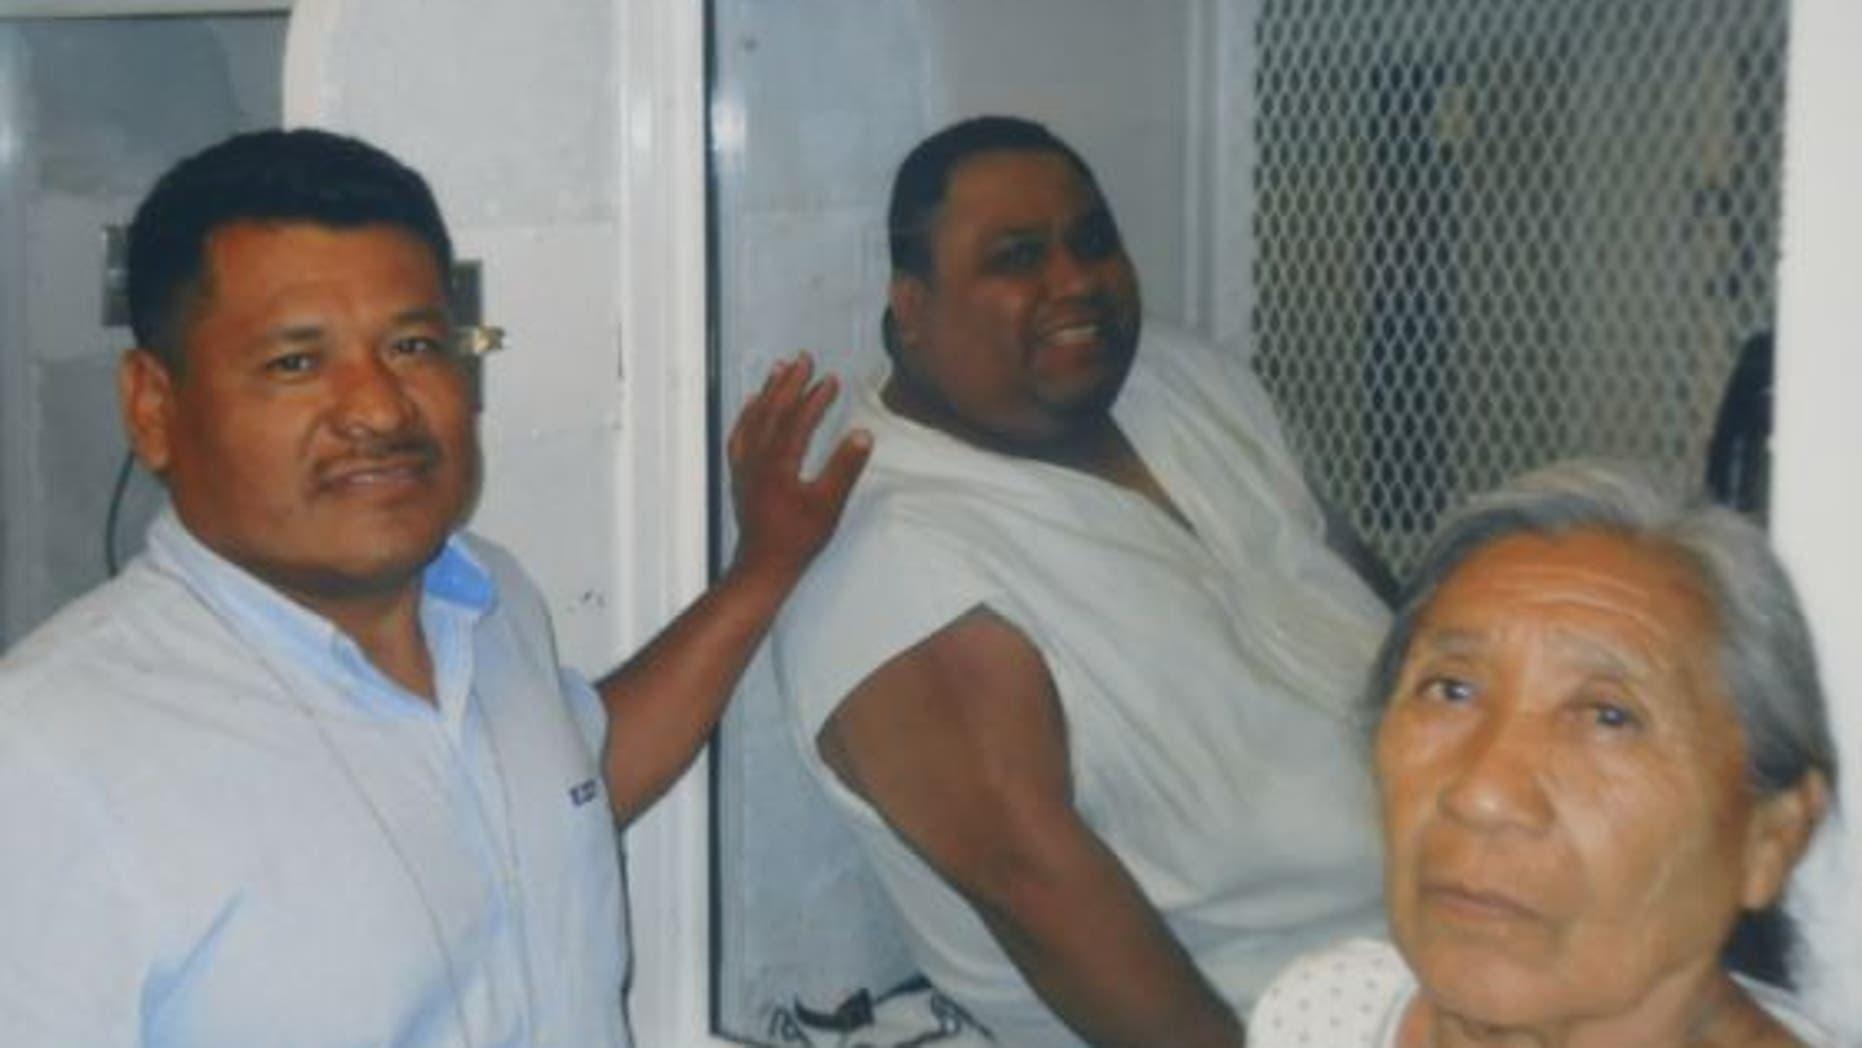 Ramiro Hernandez Llanas, center, with members of his family.